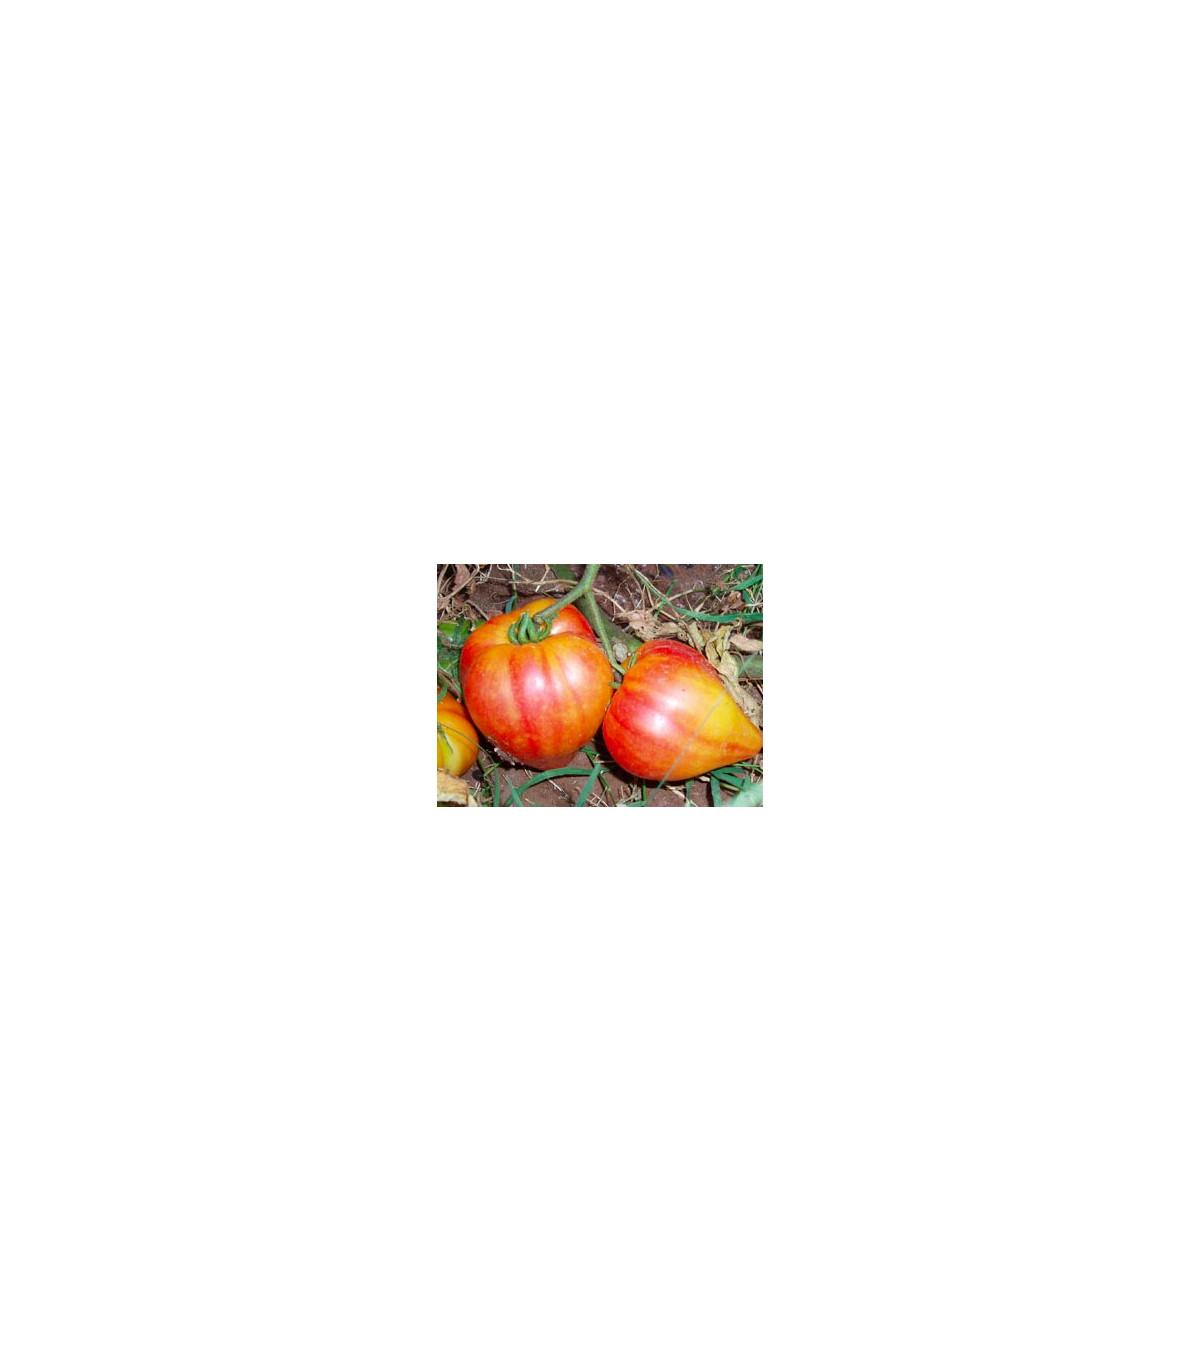 Rajče ruské oranžové - semena Rajčat - 6 ks